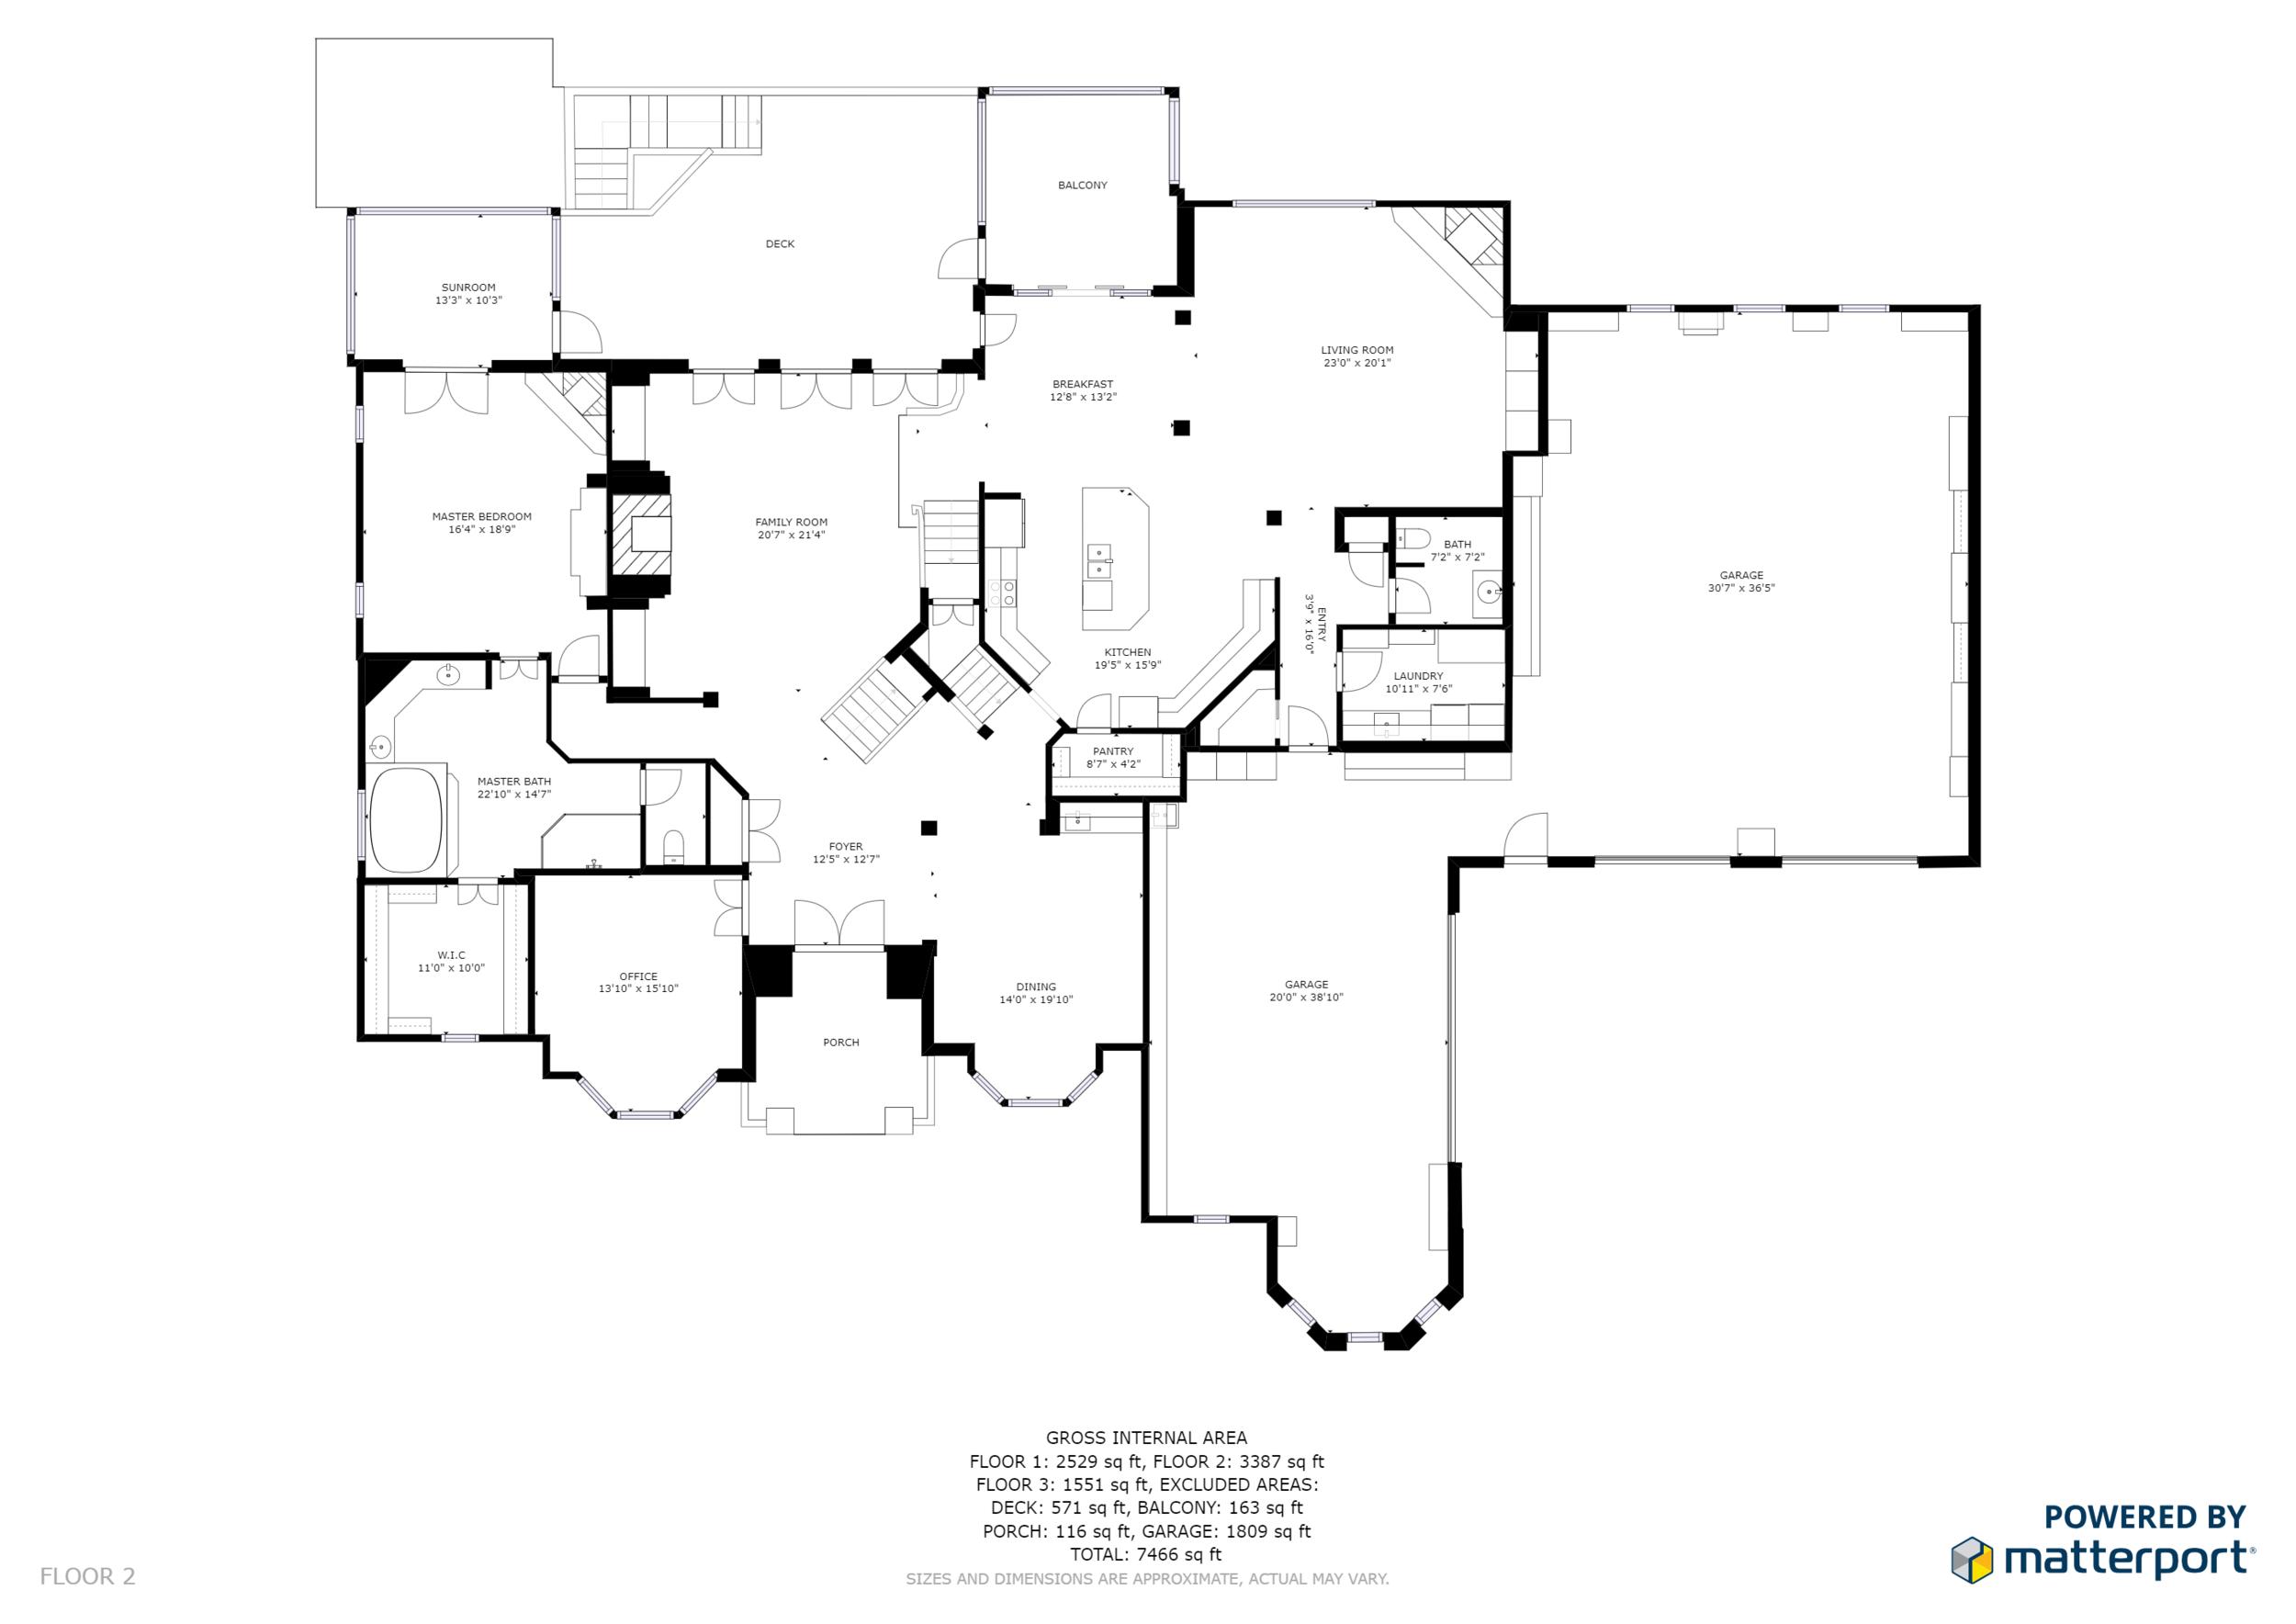 Black and White Floor Plan No Branding Floor 2